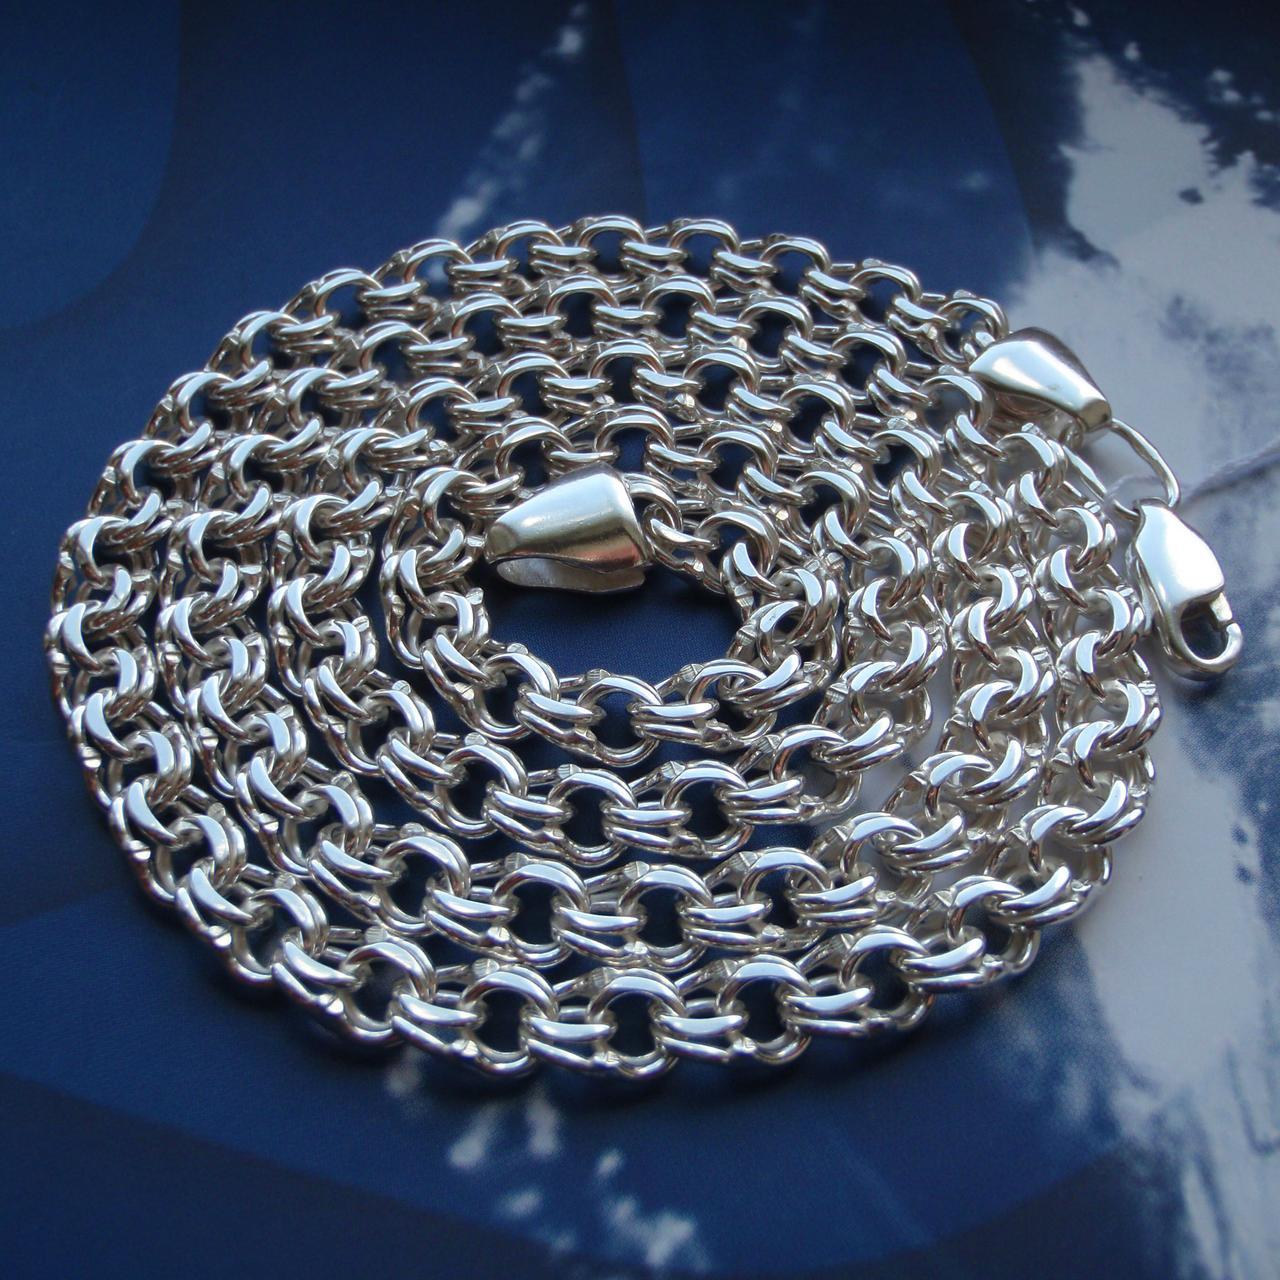 Серебряная цепочка, 600мм, 25 грамм, Бисмарк, светлое серебро